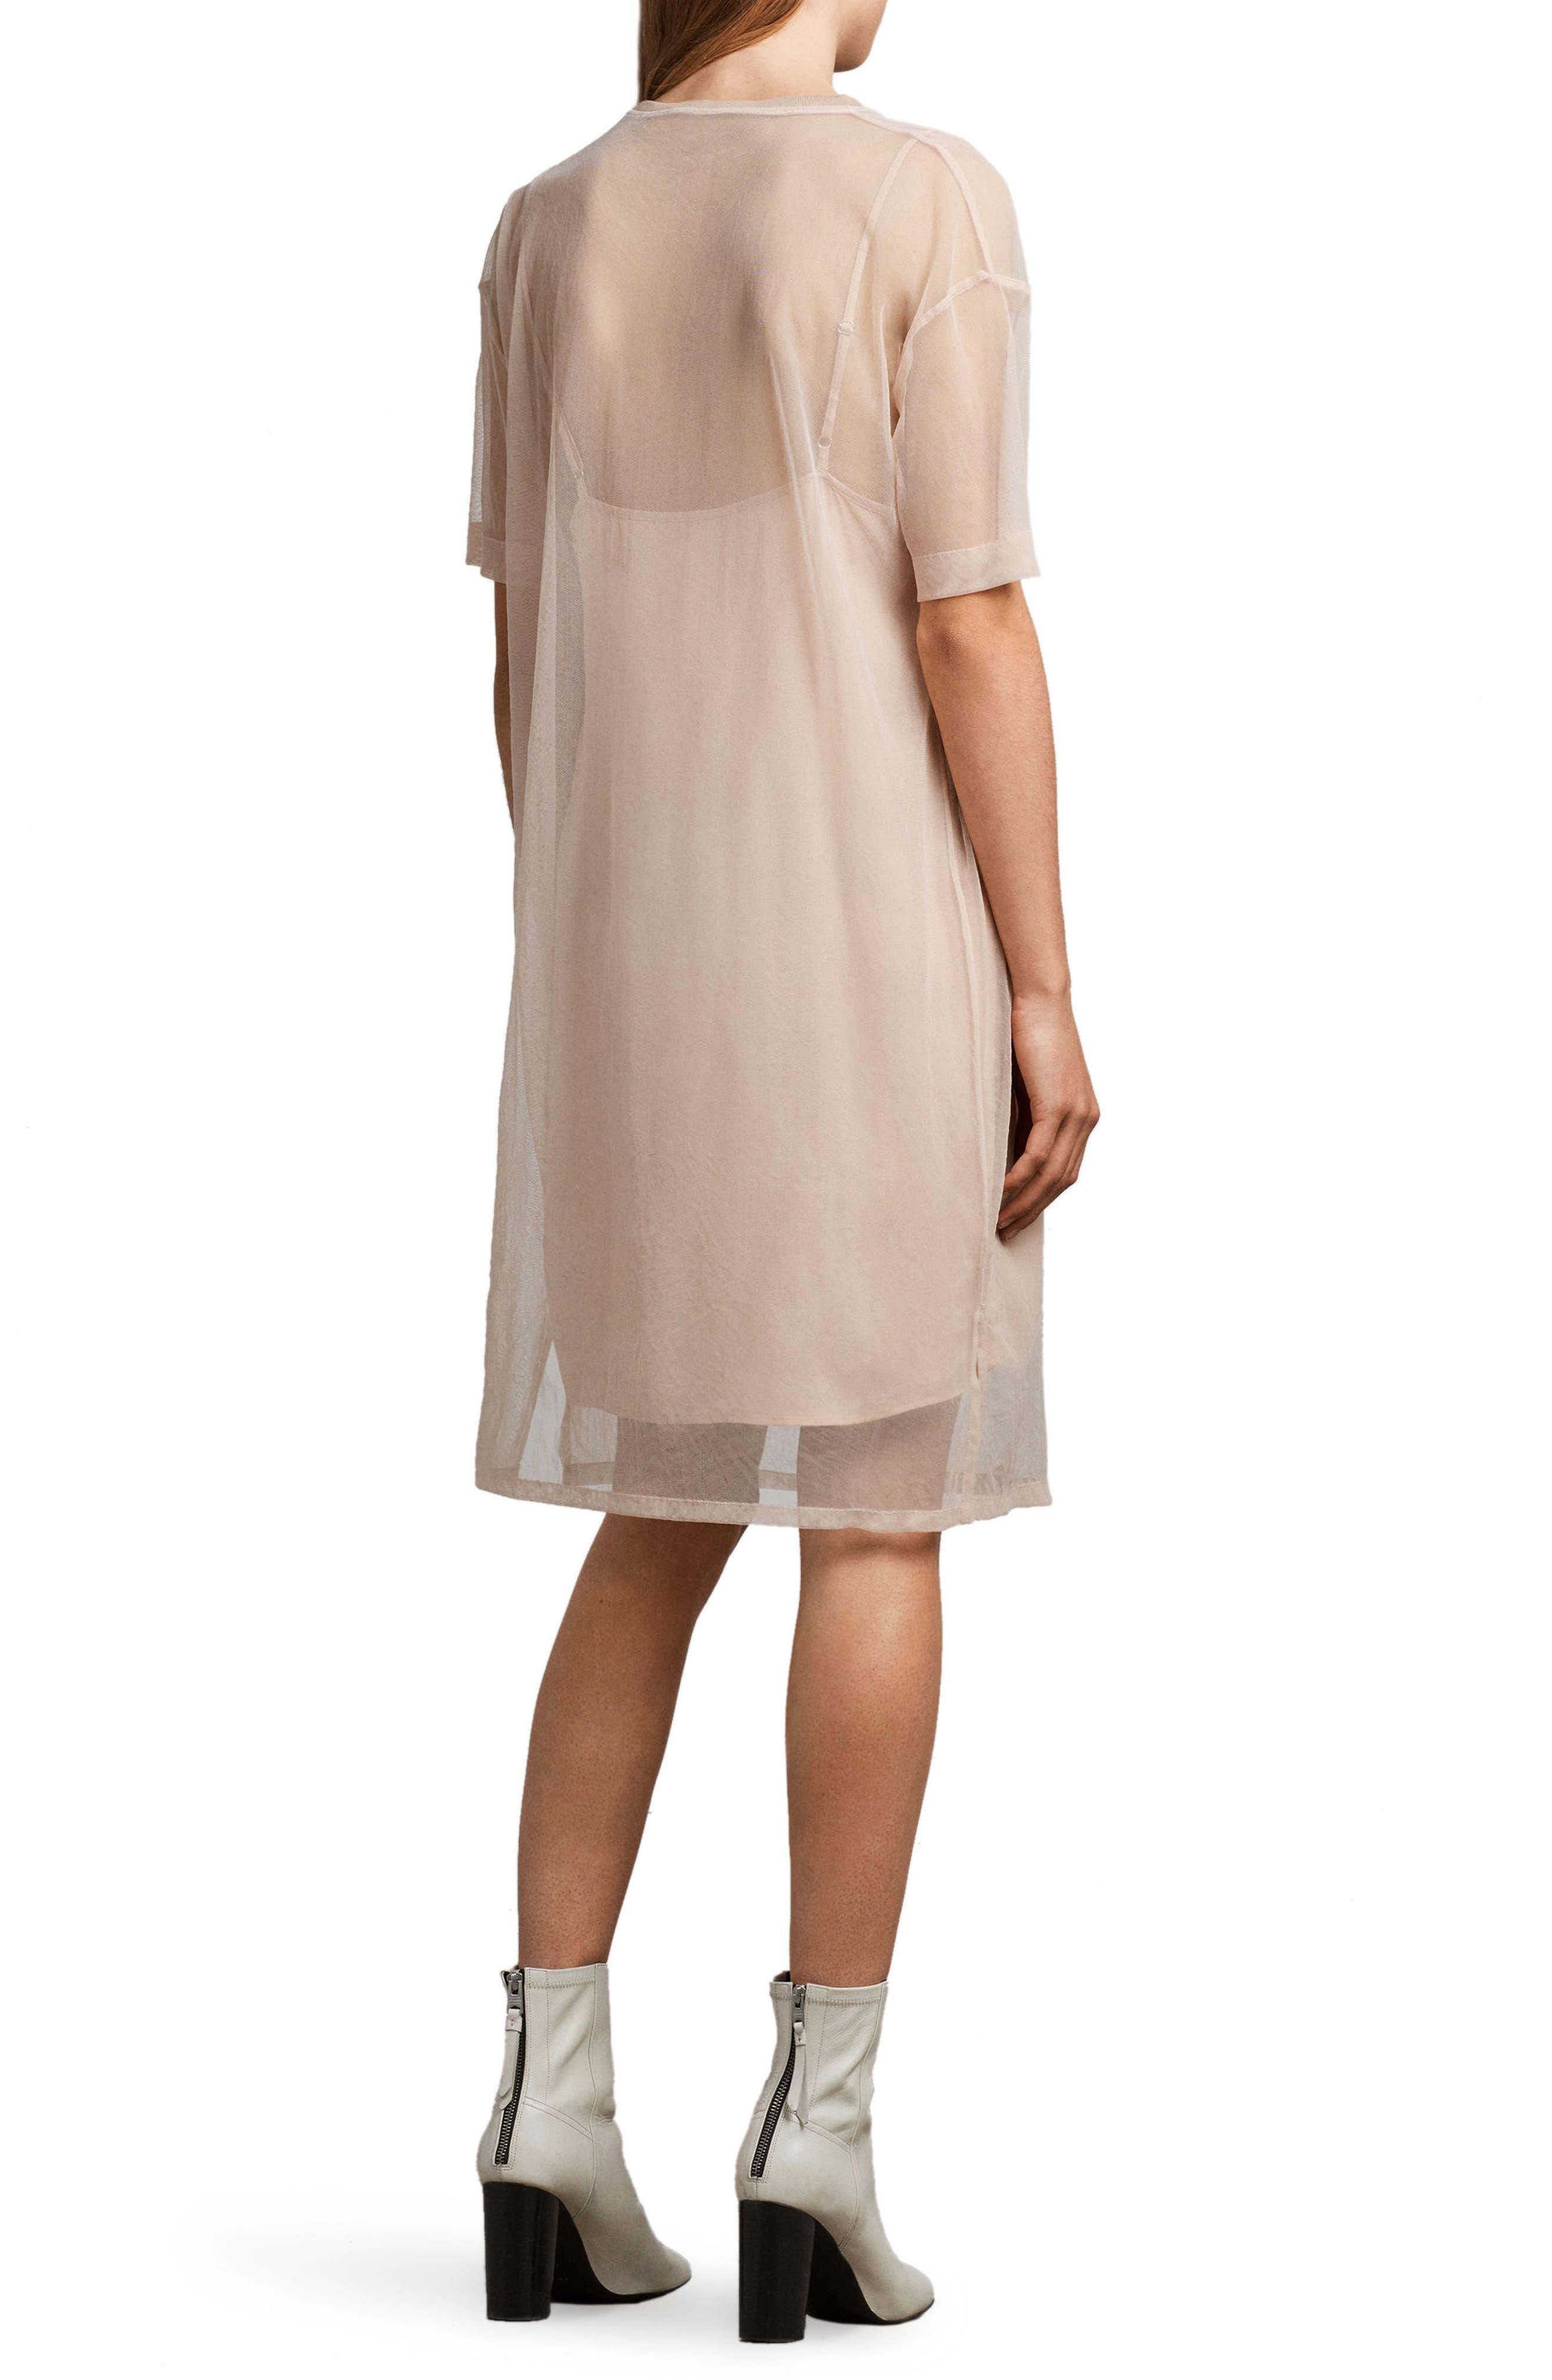 Kyla Floral Print Dress,                             Alternate thumbnail 2, color,                             Pale Pink